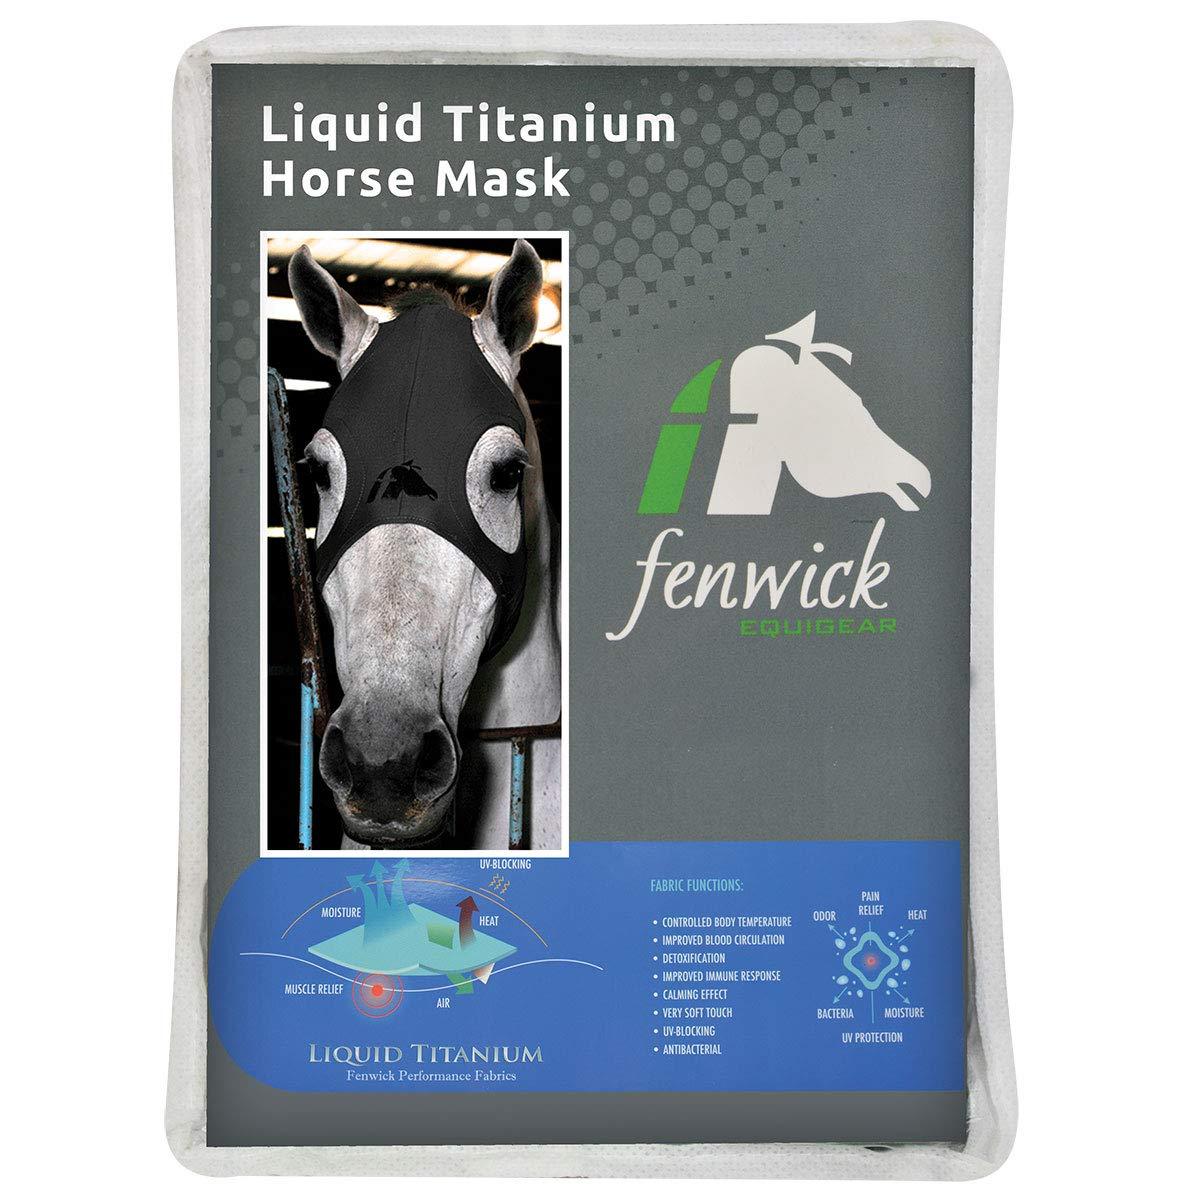 Fenwick Liquid Titanium Therapeutic Horse Mask - Medium - Grey by Fenwick